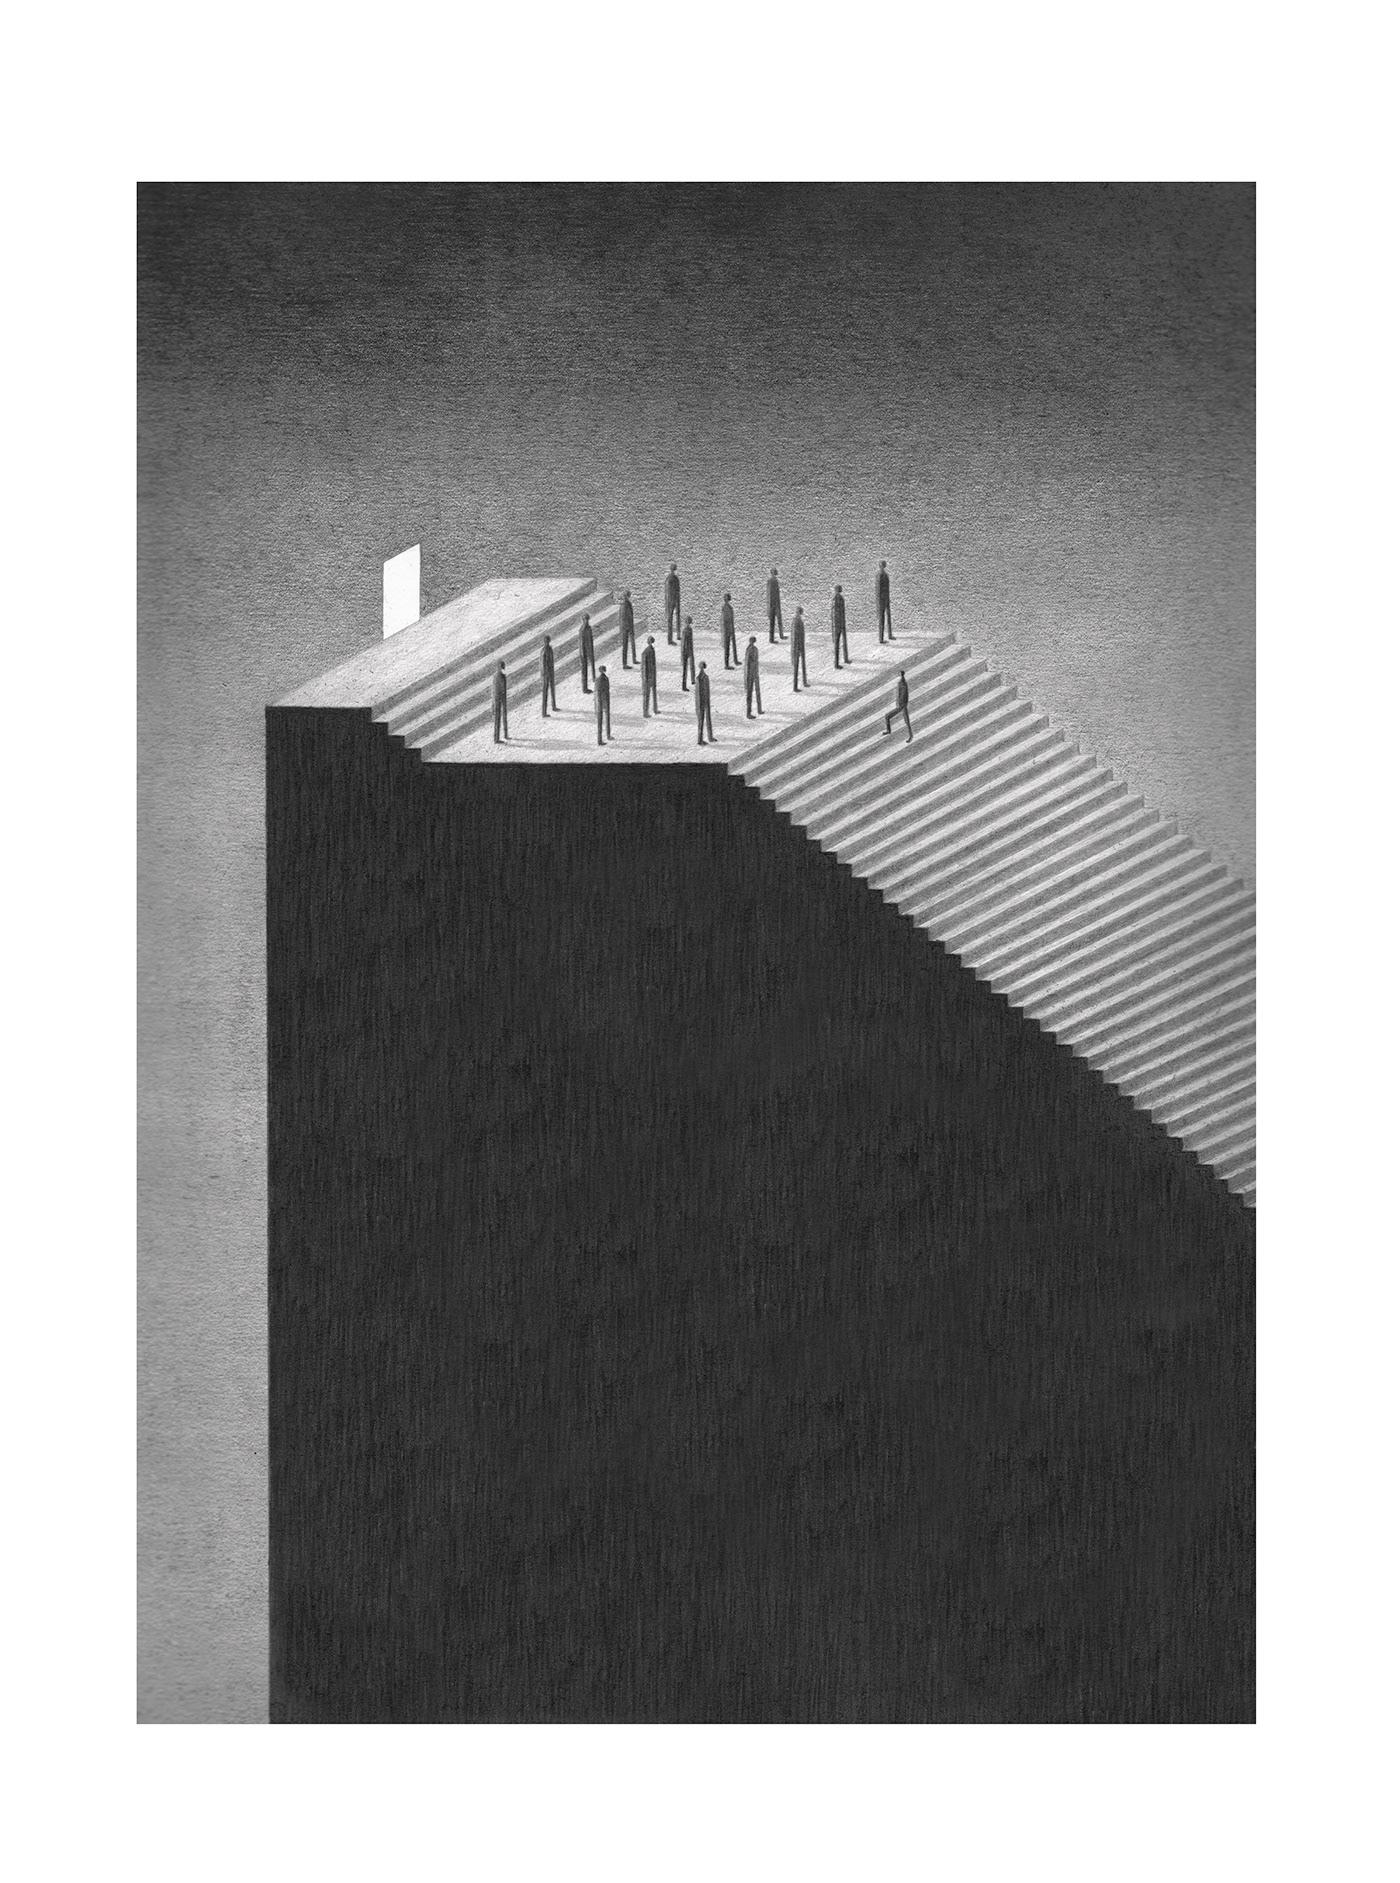 Image may contain: black and white, monochrome and skyscraper